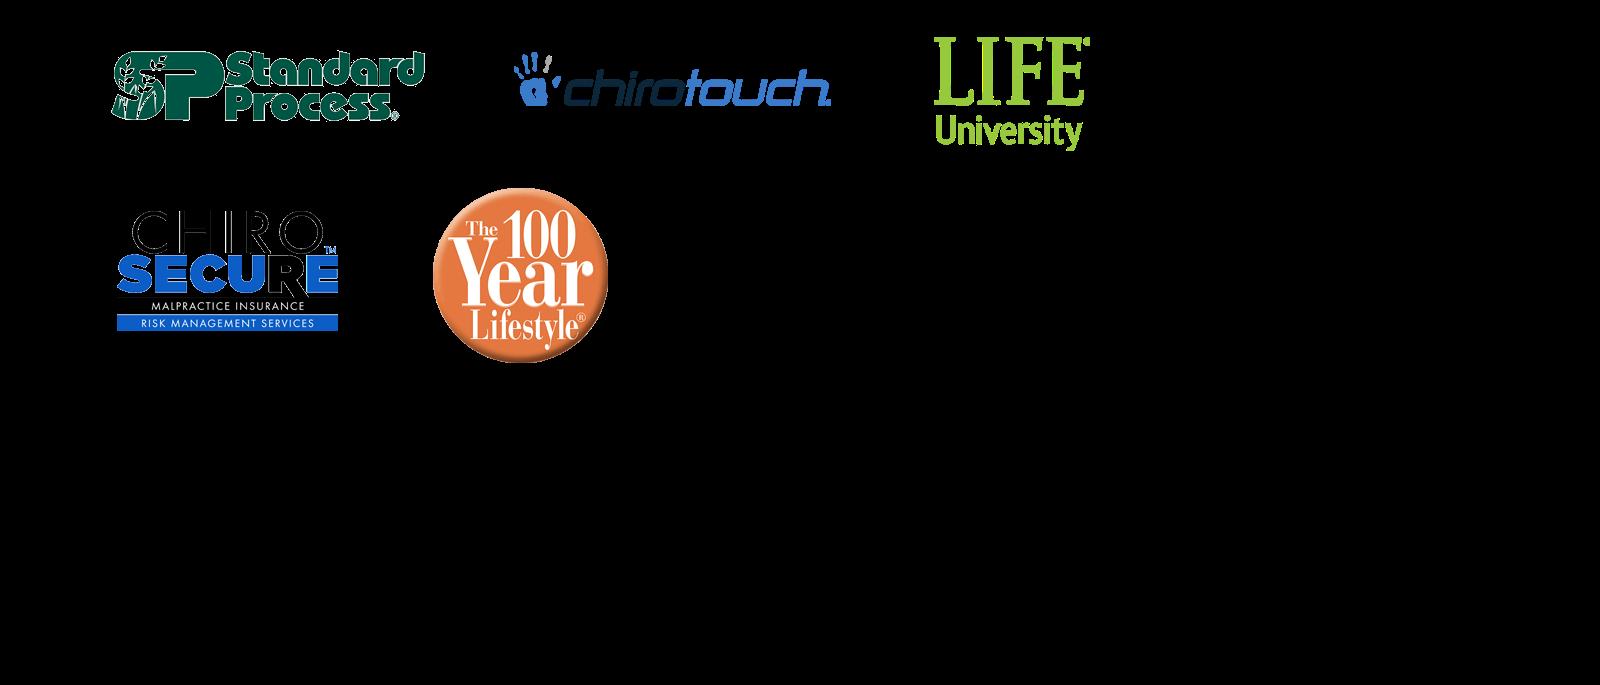 3737-vision2019-sponsors